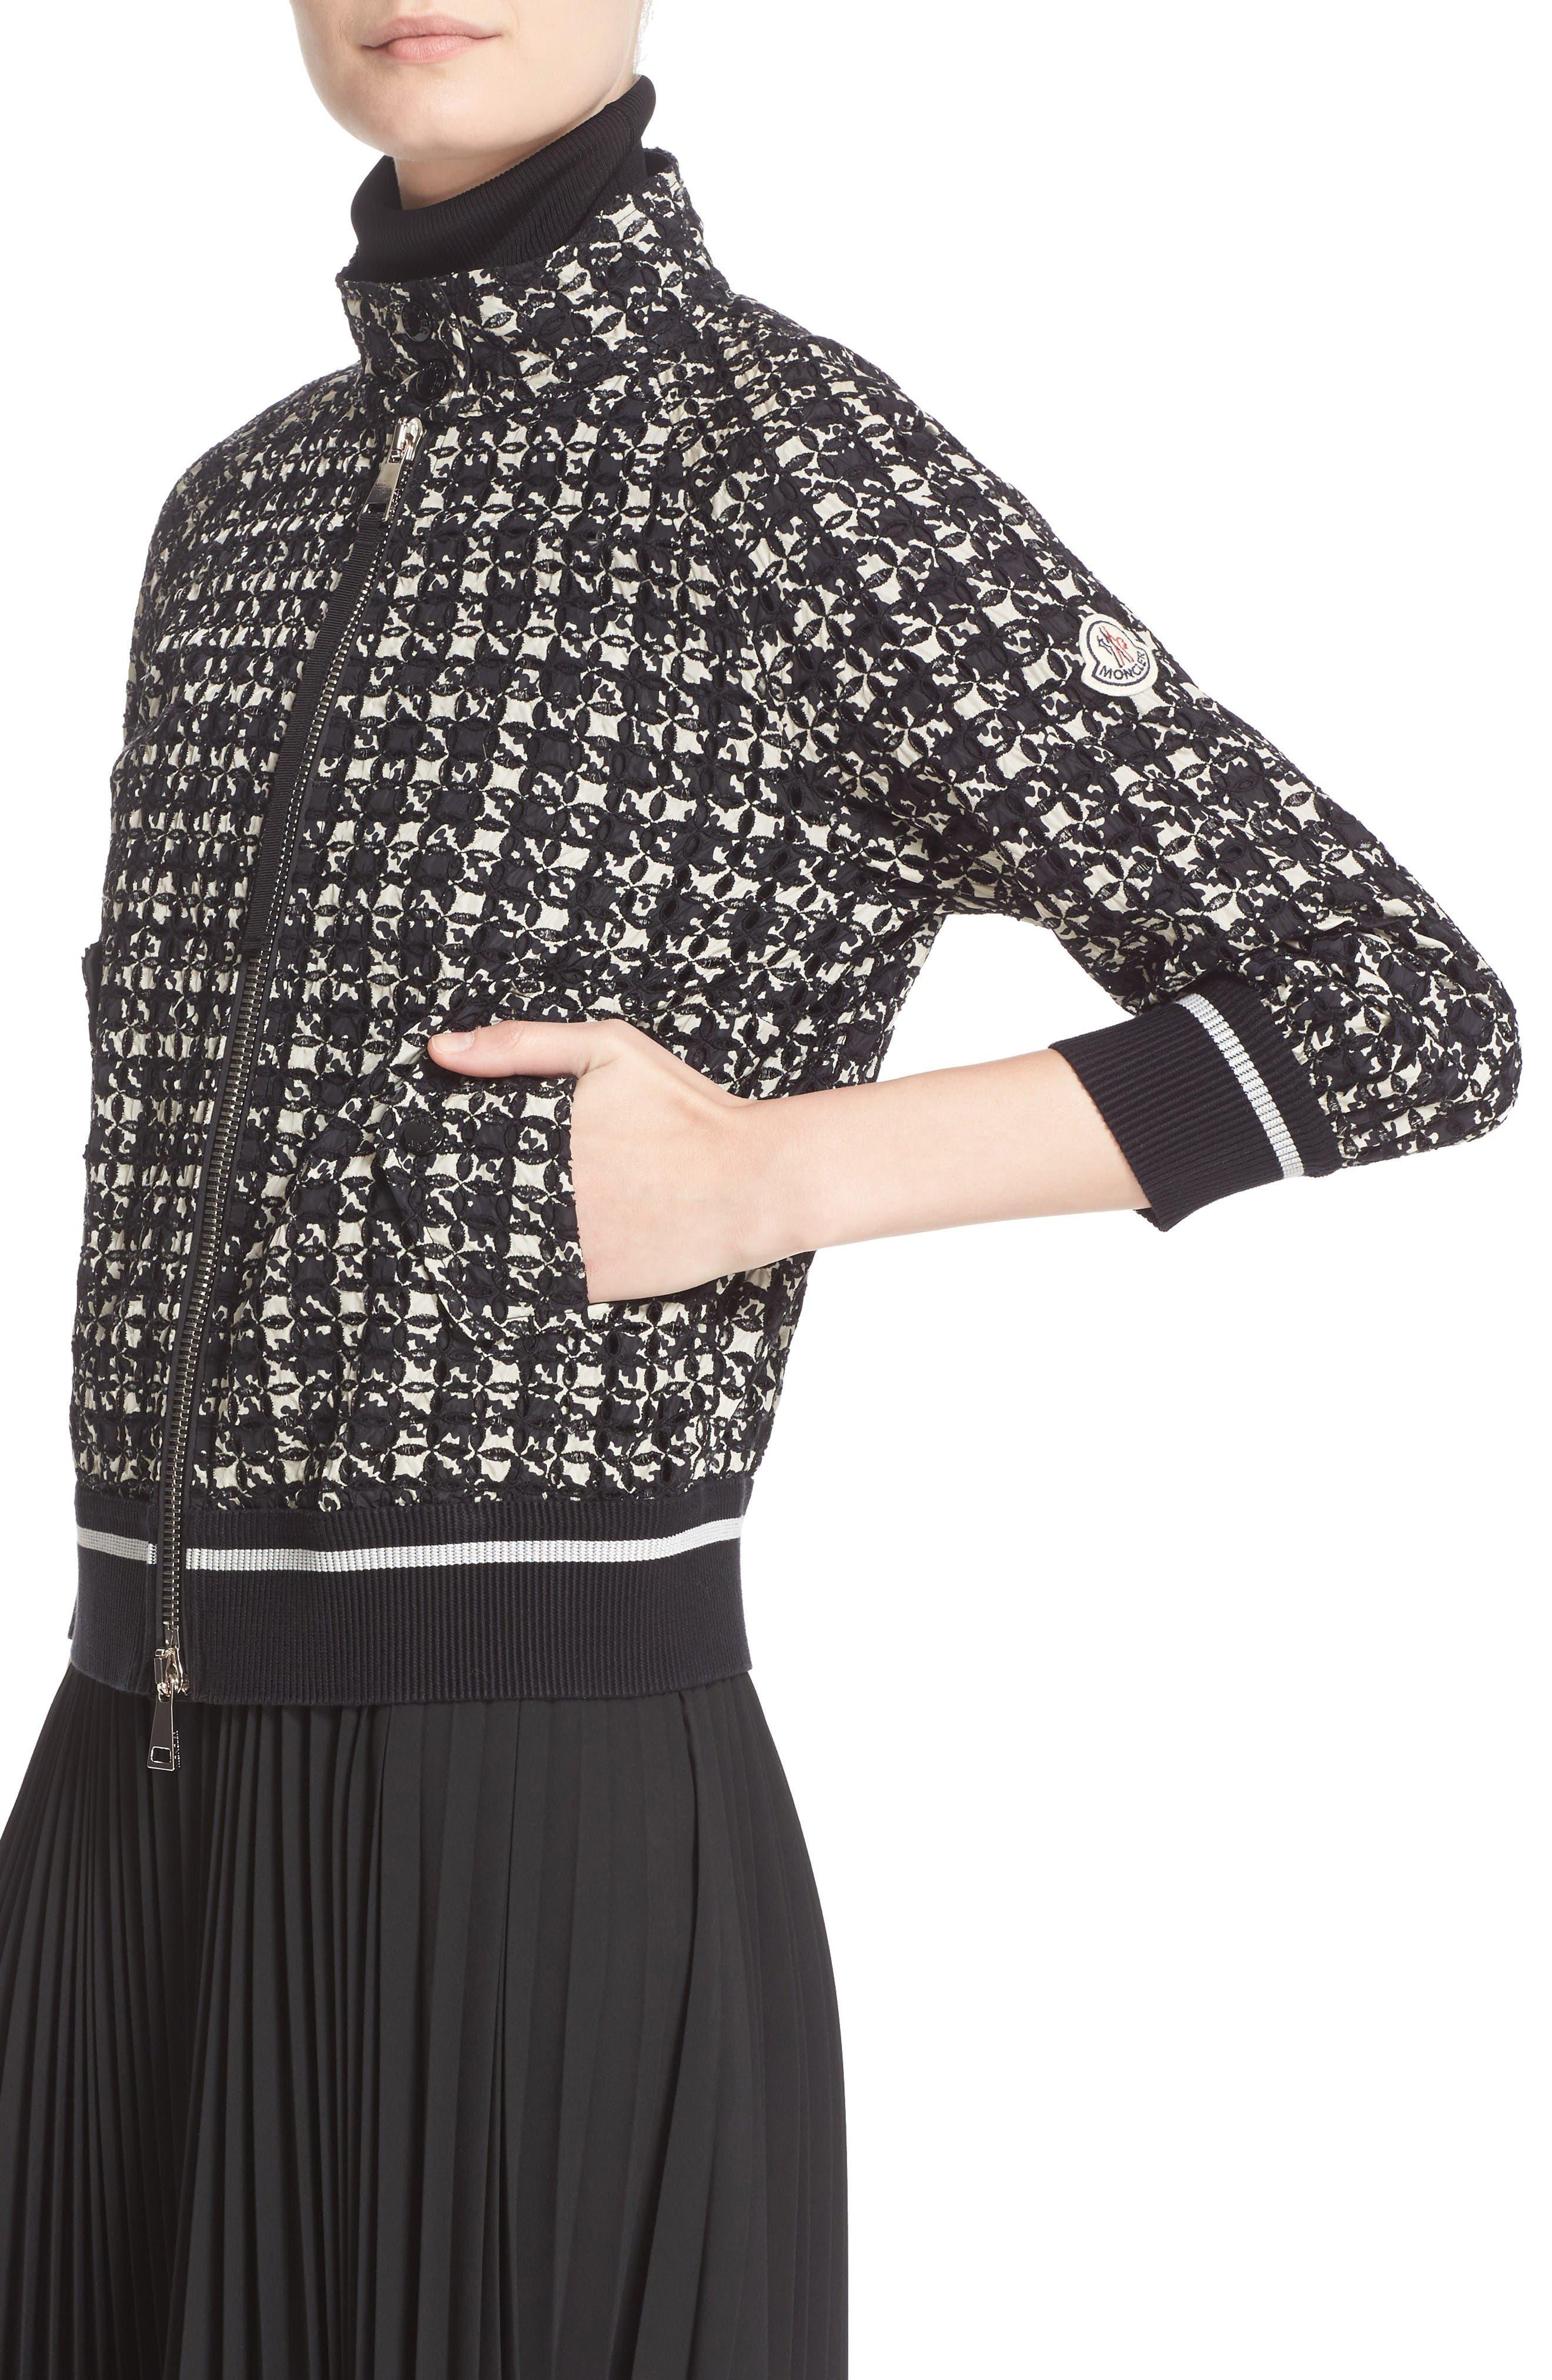 Fiadone Tweed Print Jacket,                             Alternate thumbnail 5, color,                             Black